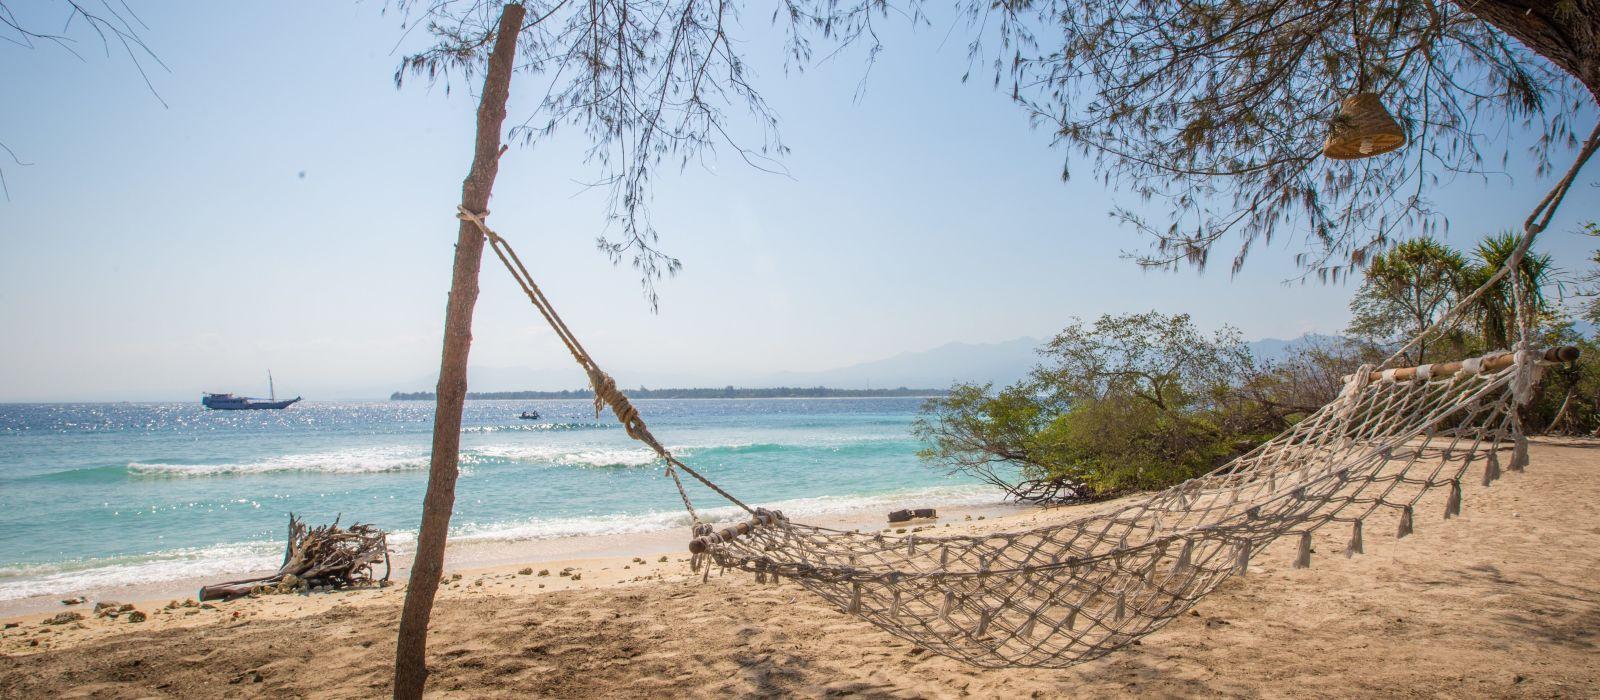 Reiseziel Gili Meno Indonesien